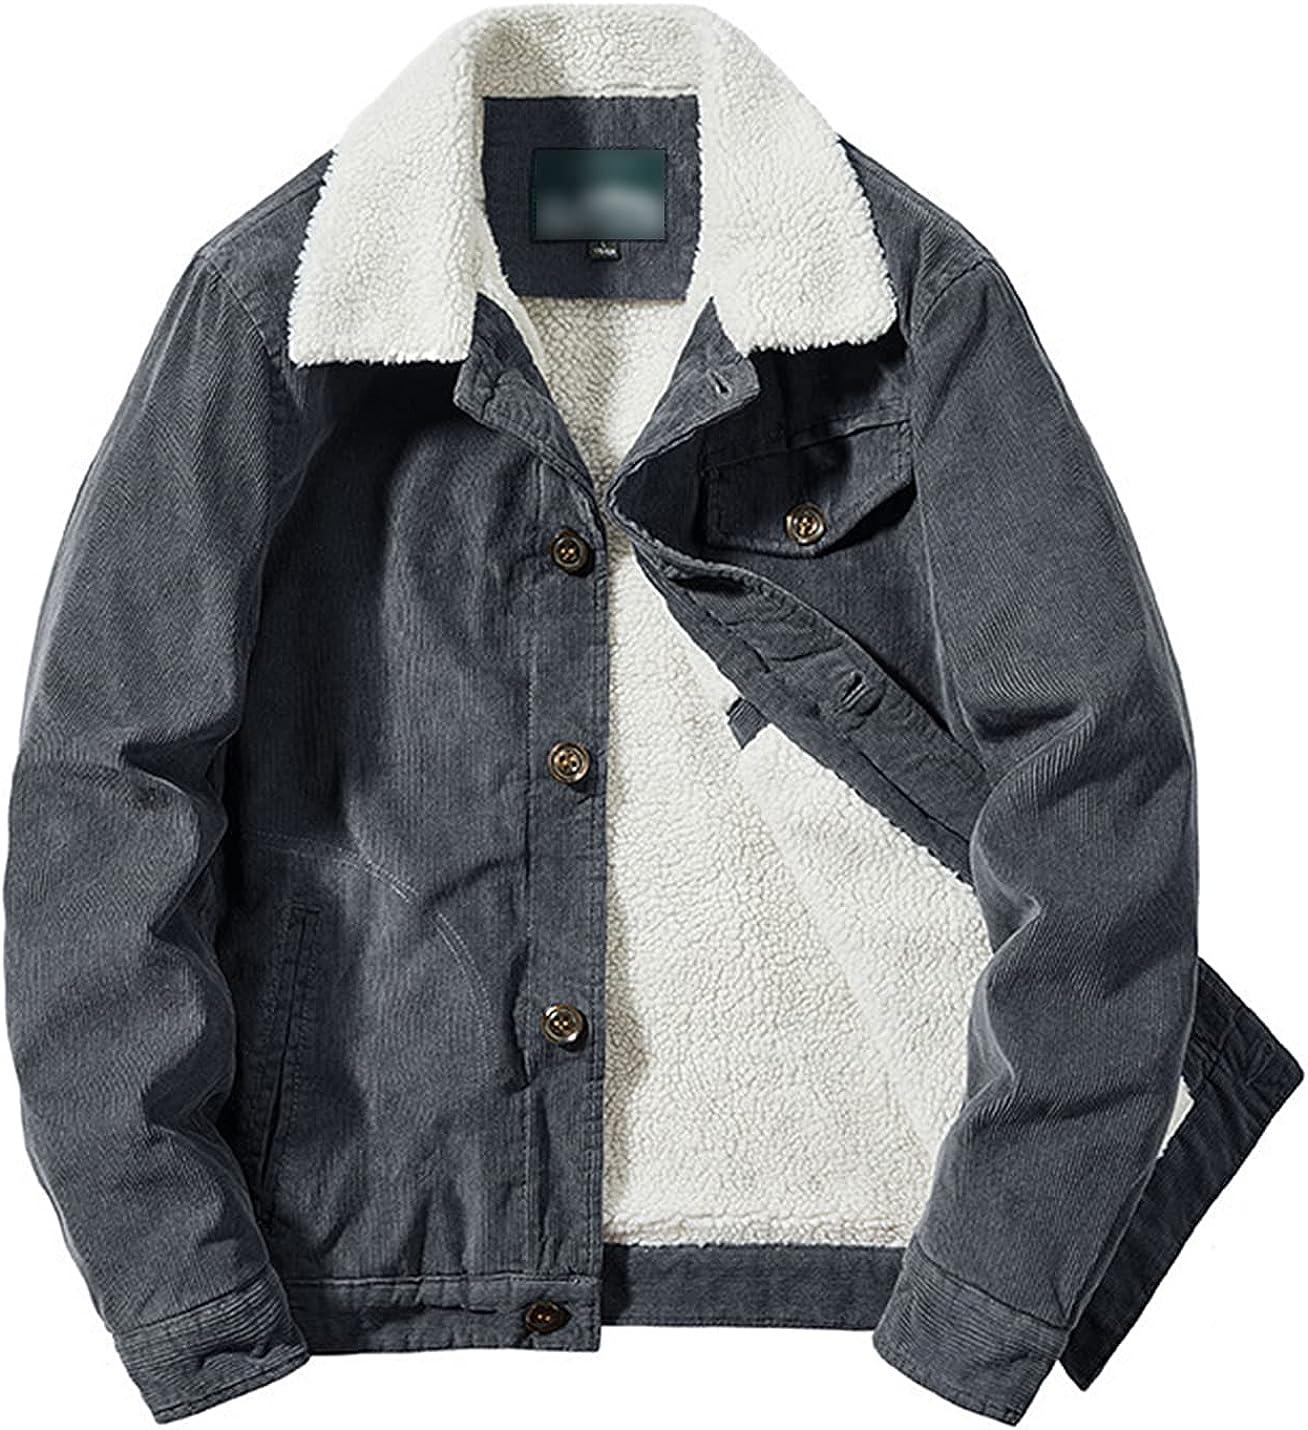 Kissonic 5 popular Men's Casual Warm Sherpa Down Long Sleeve Lined Button Cheap SALE Start